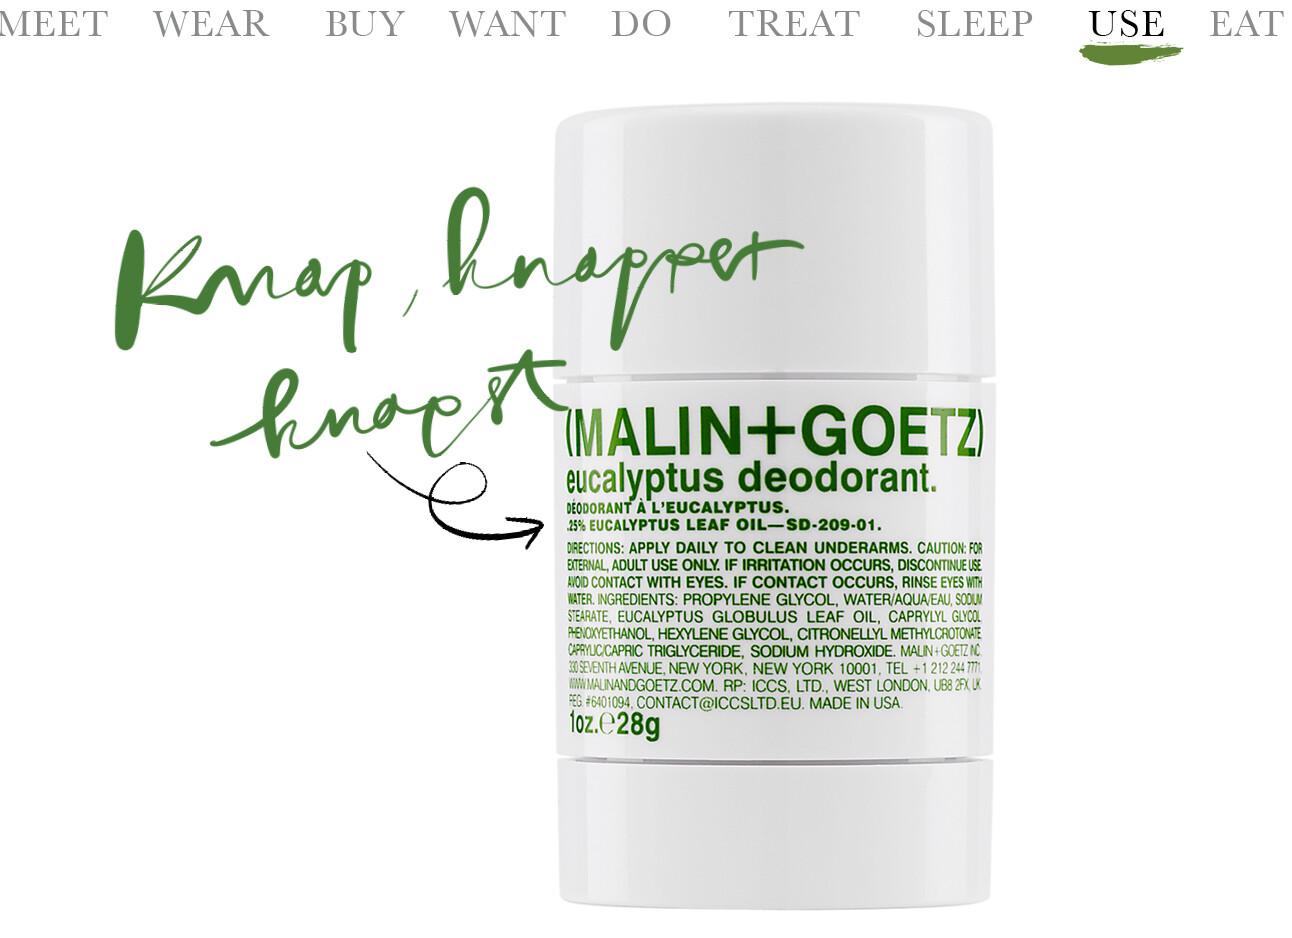 MALIN +GOETZdeodorant